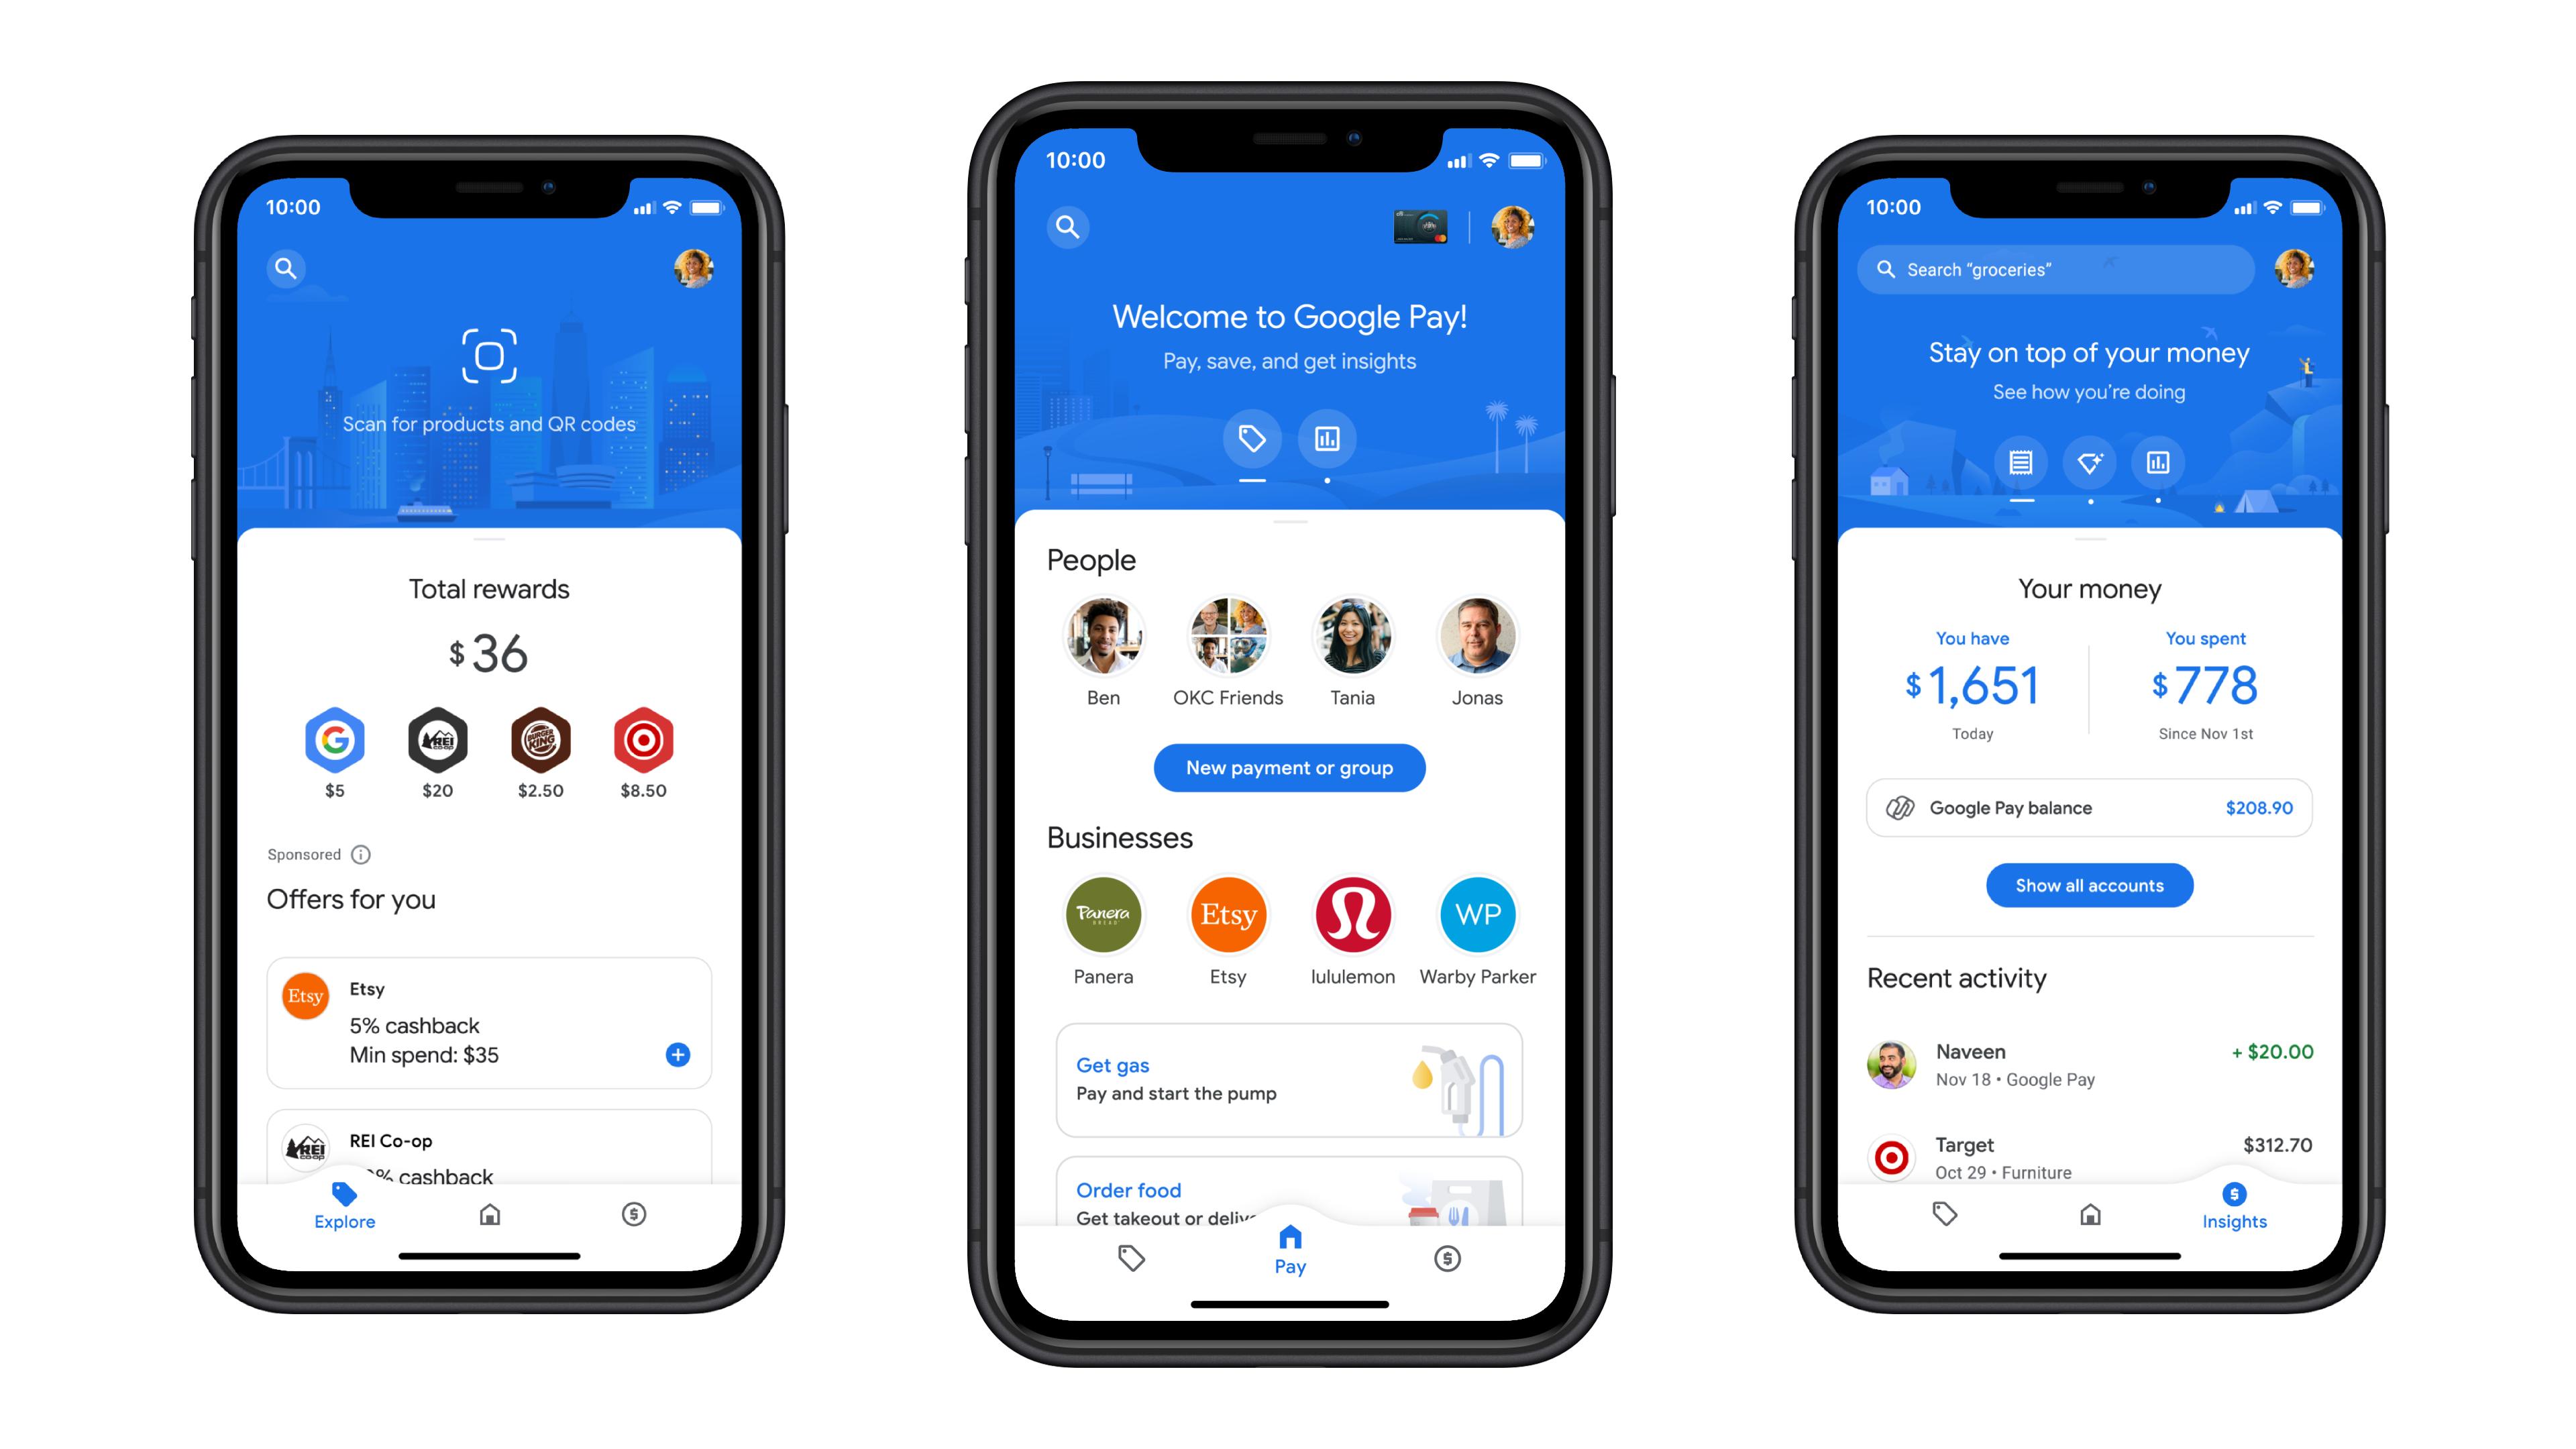 Google Pay gets a major